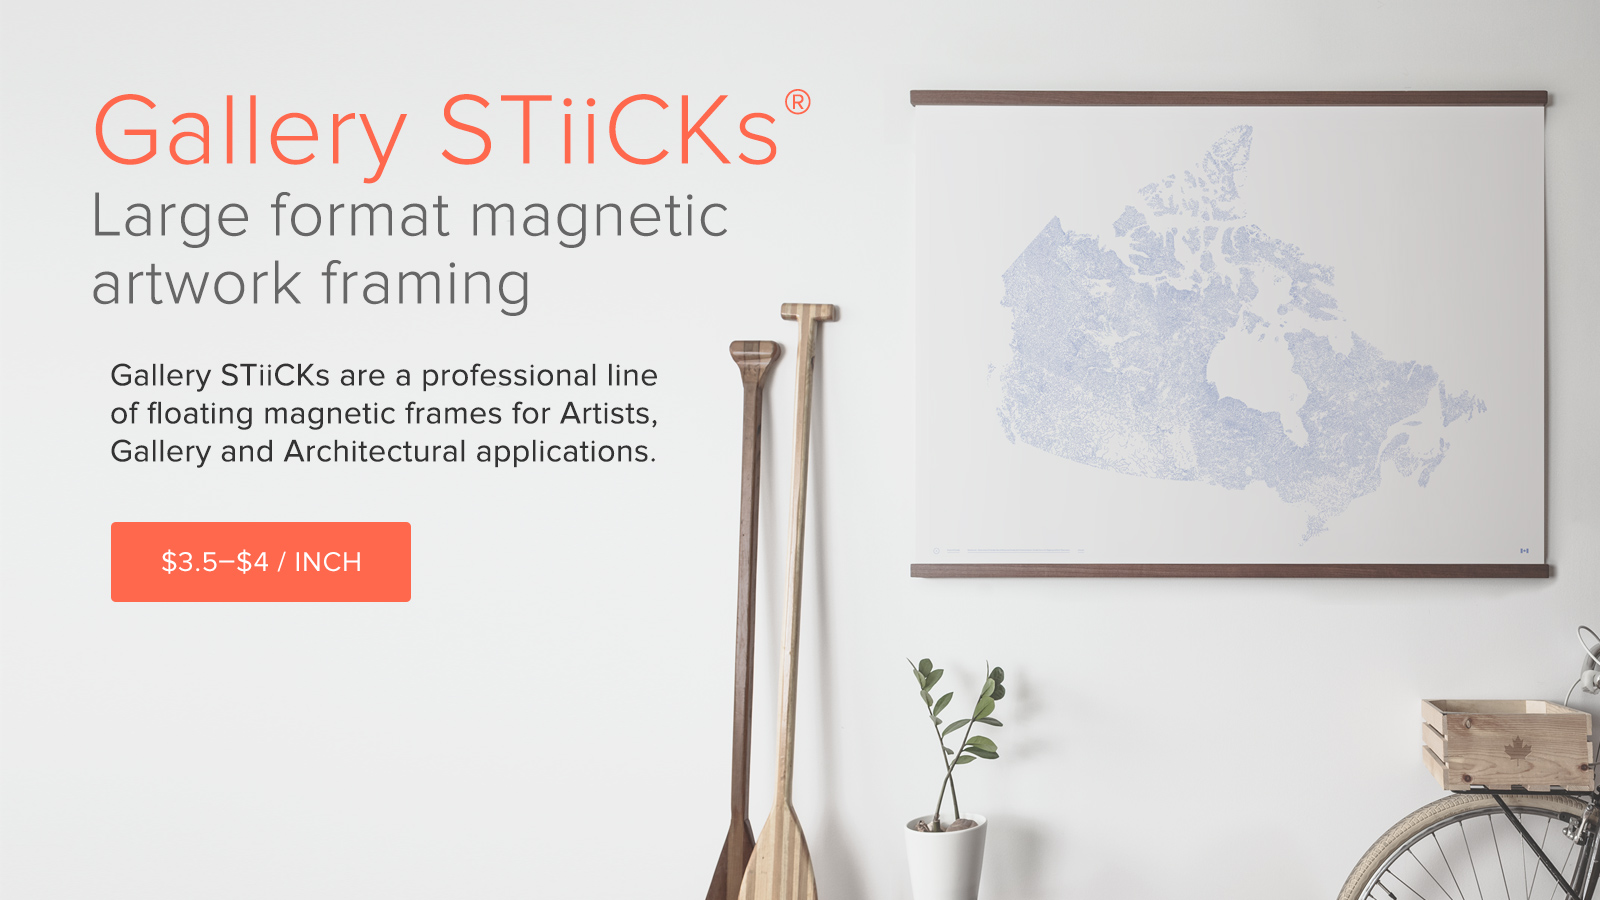 Large format framing alternative